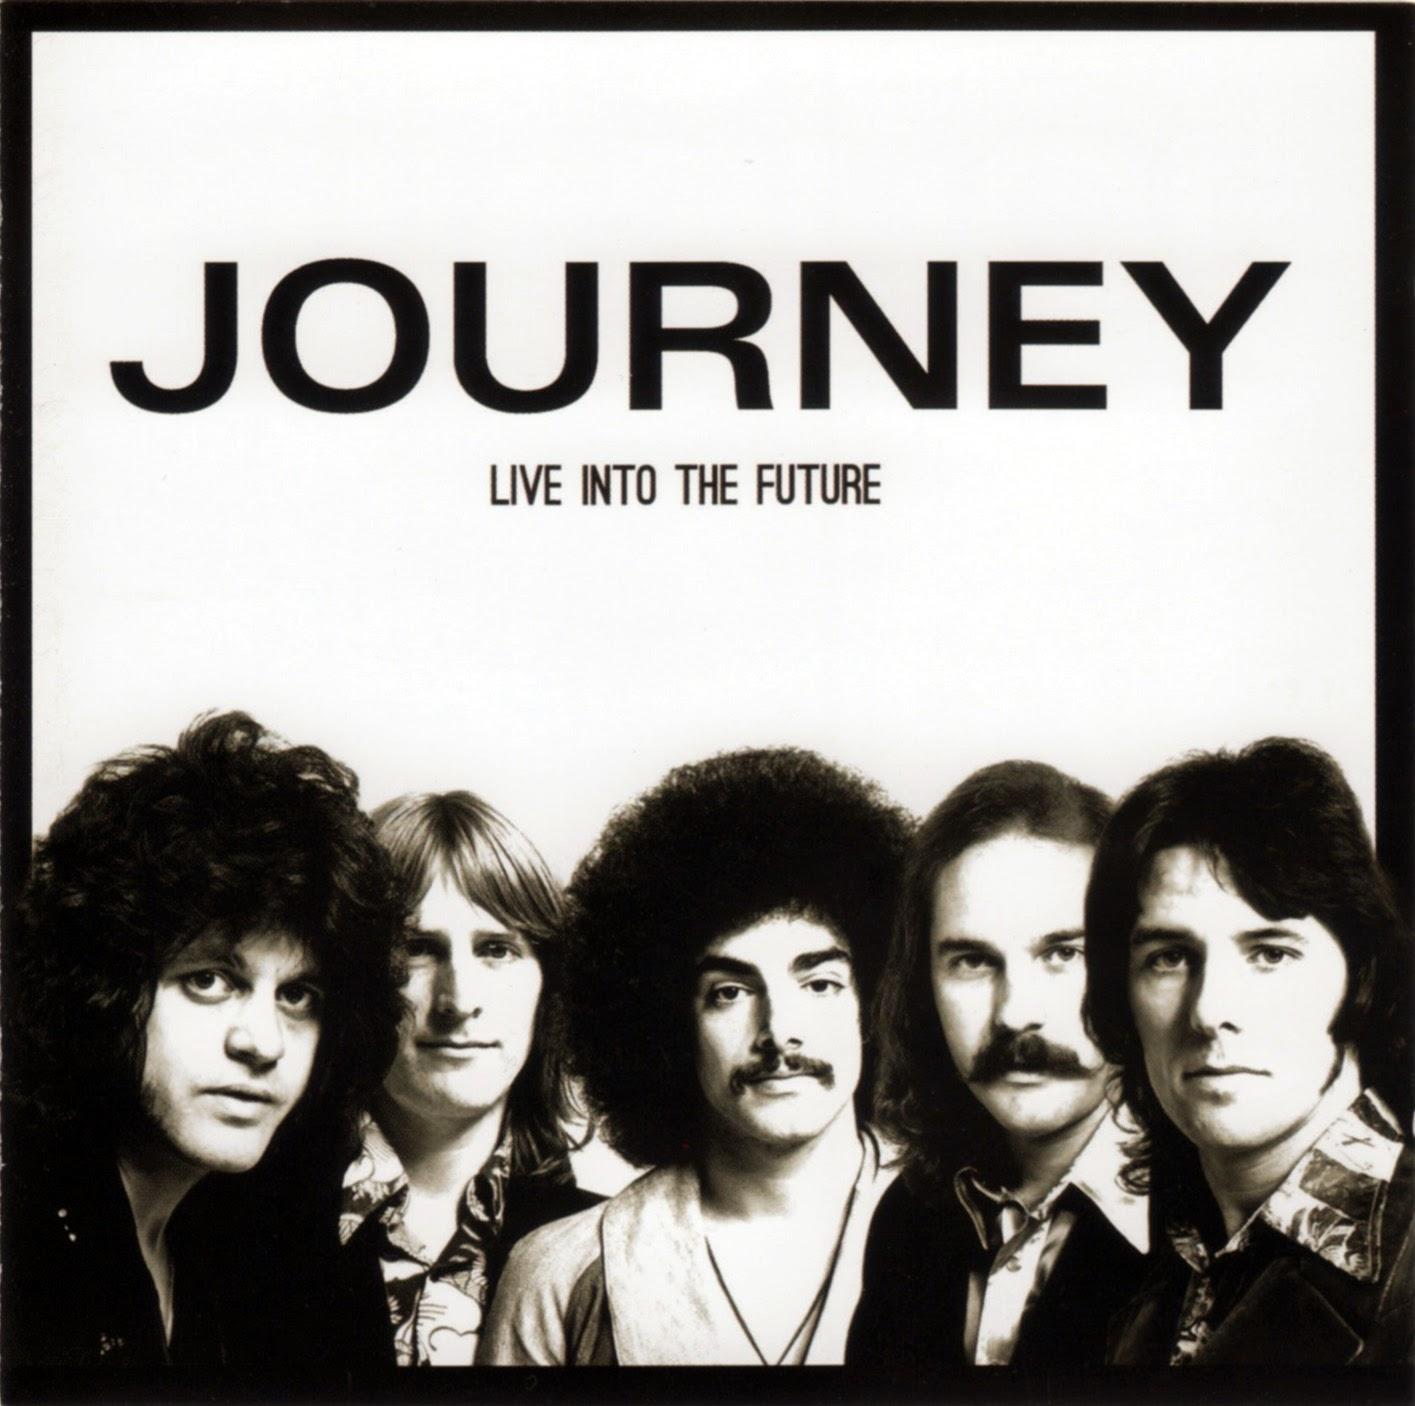 journey_live_into_the_future